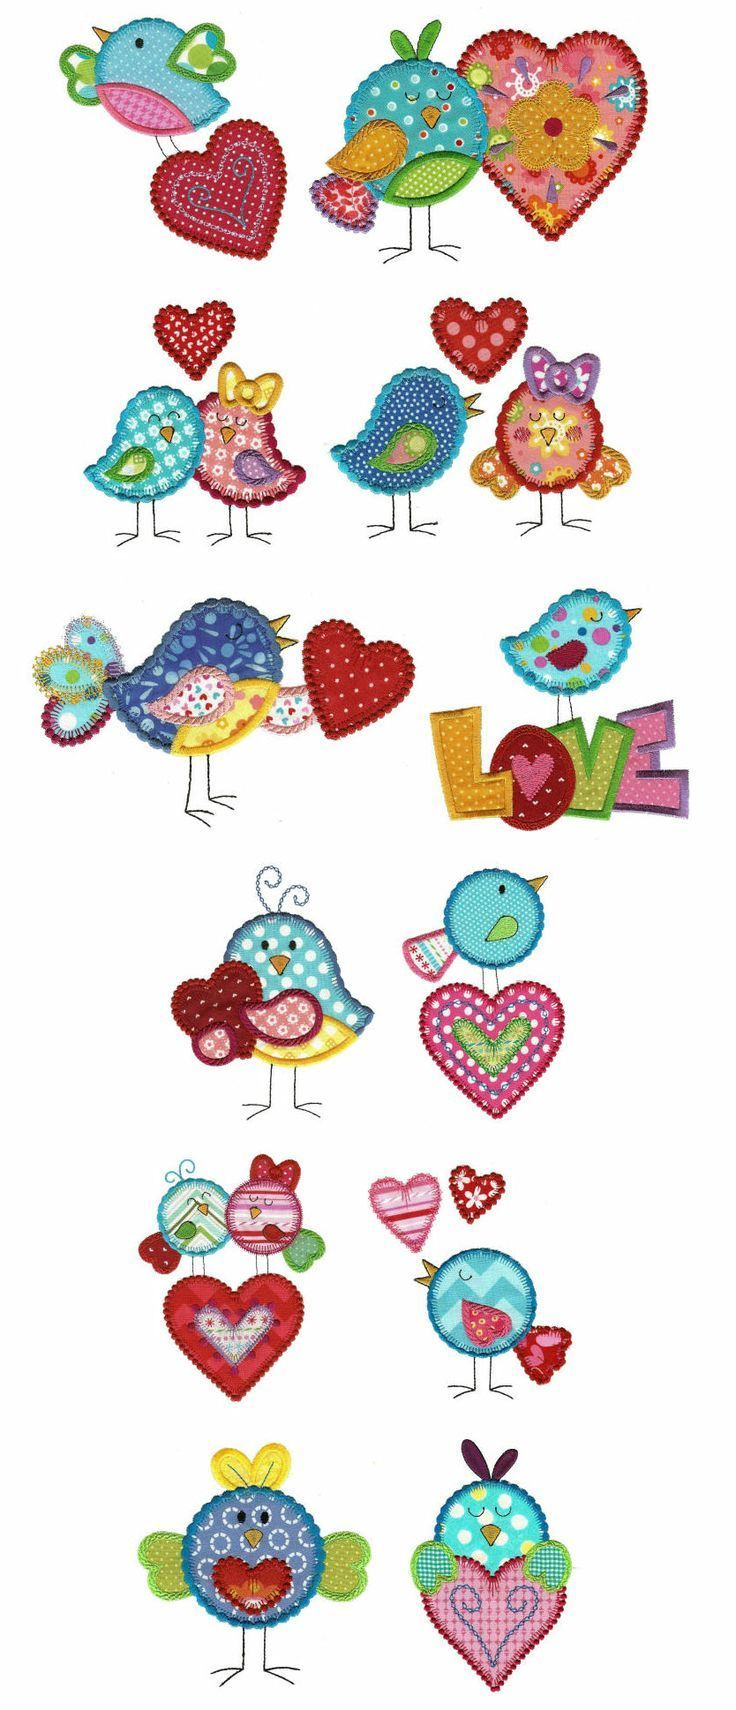 Embroidery Designs | Applique Machine Embroidery Designs | Love Birds Applique